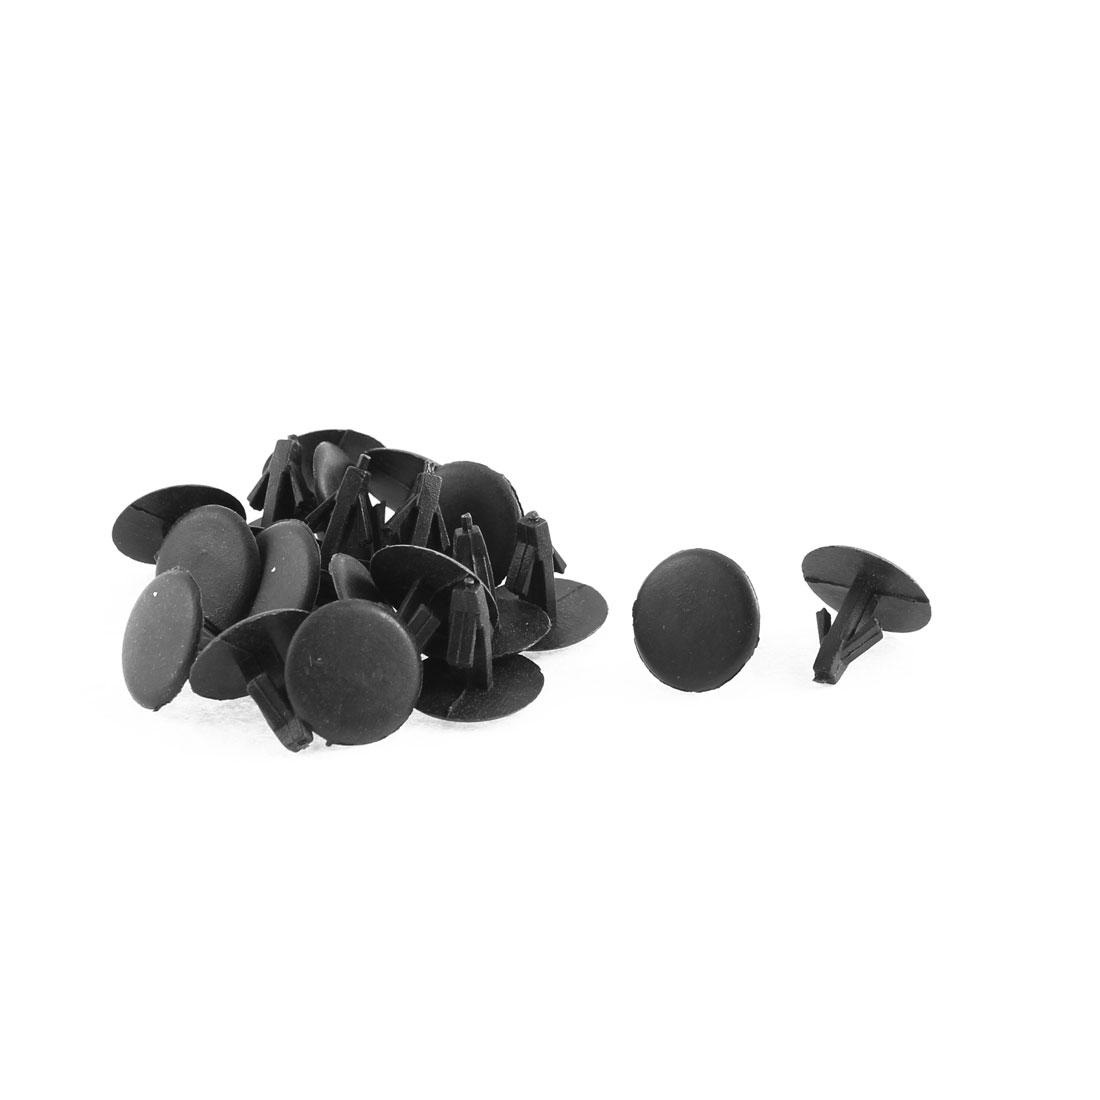 15 Pcs Black Plastic Door Trim Buckle Mat Fastener Rivet for Toyota